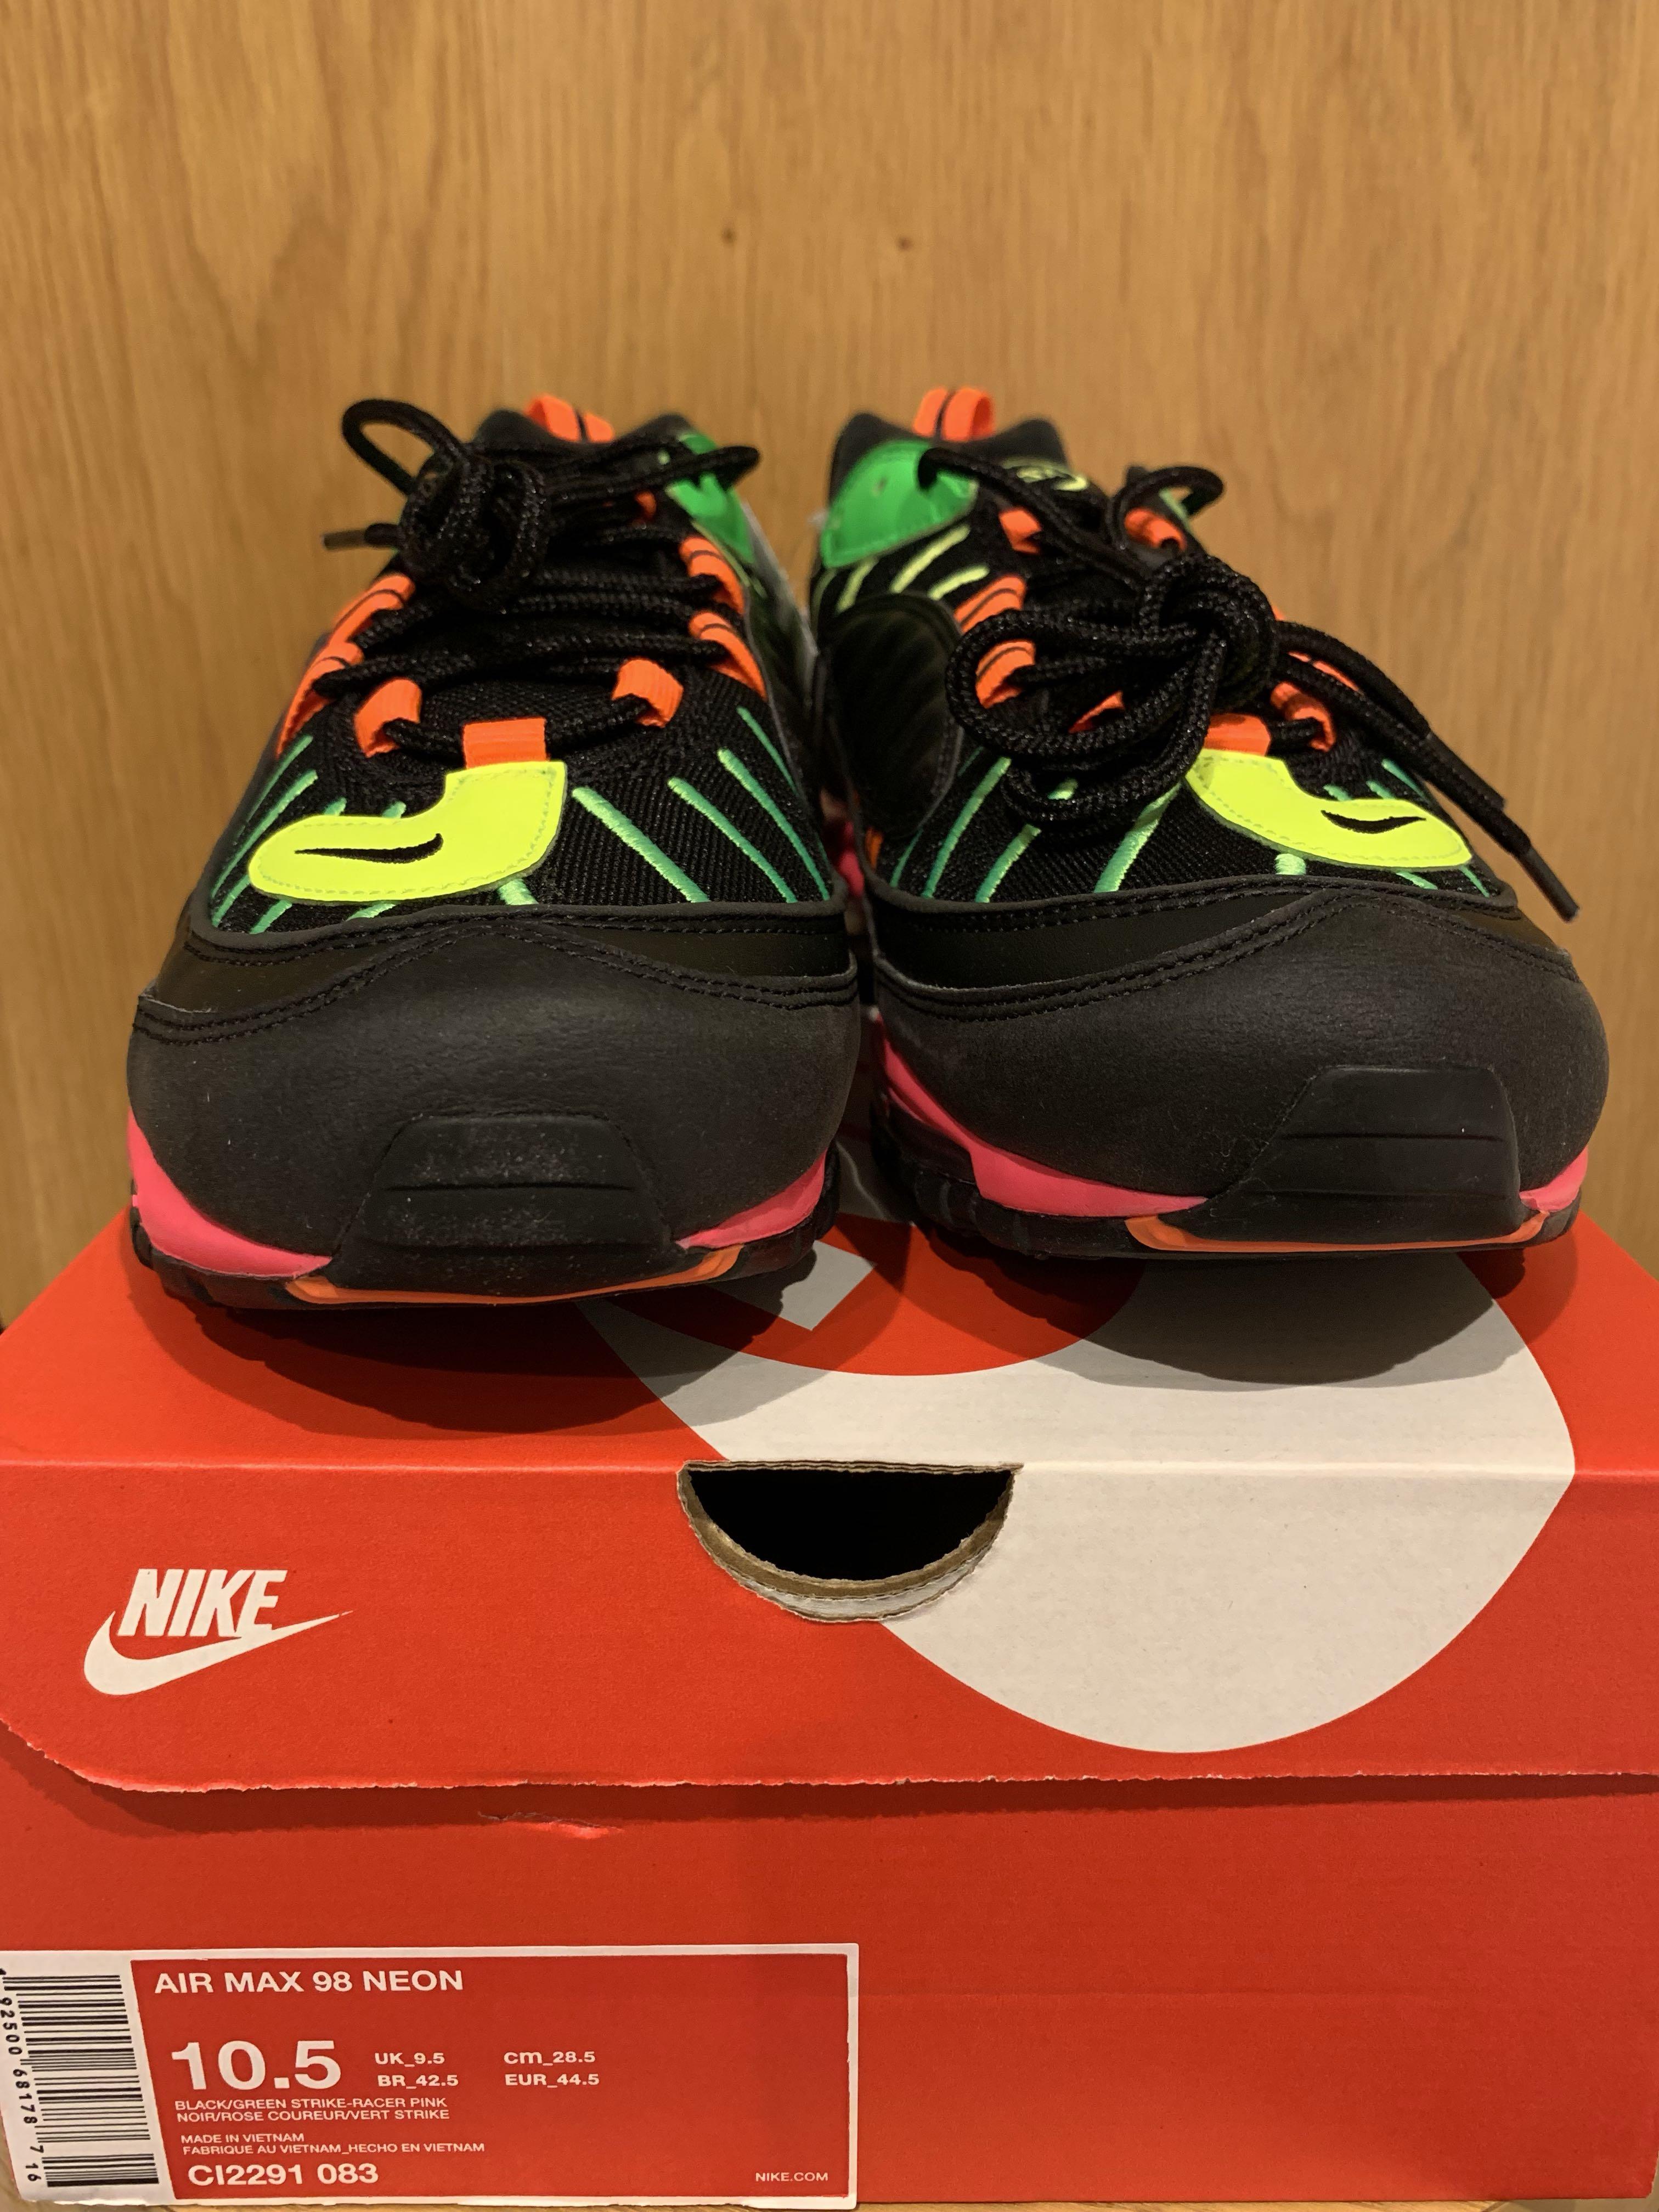 24a45d2c32 Nike air max 98 neon, Men's Fashion, Men's Footwear on Carousell